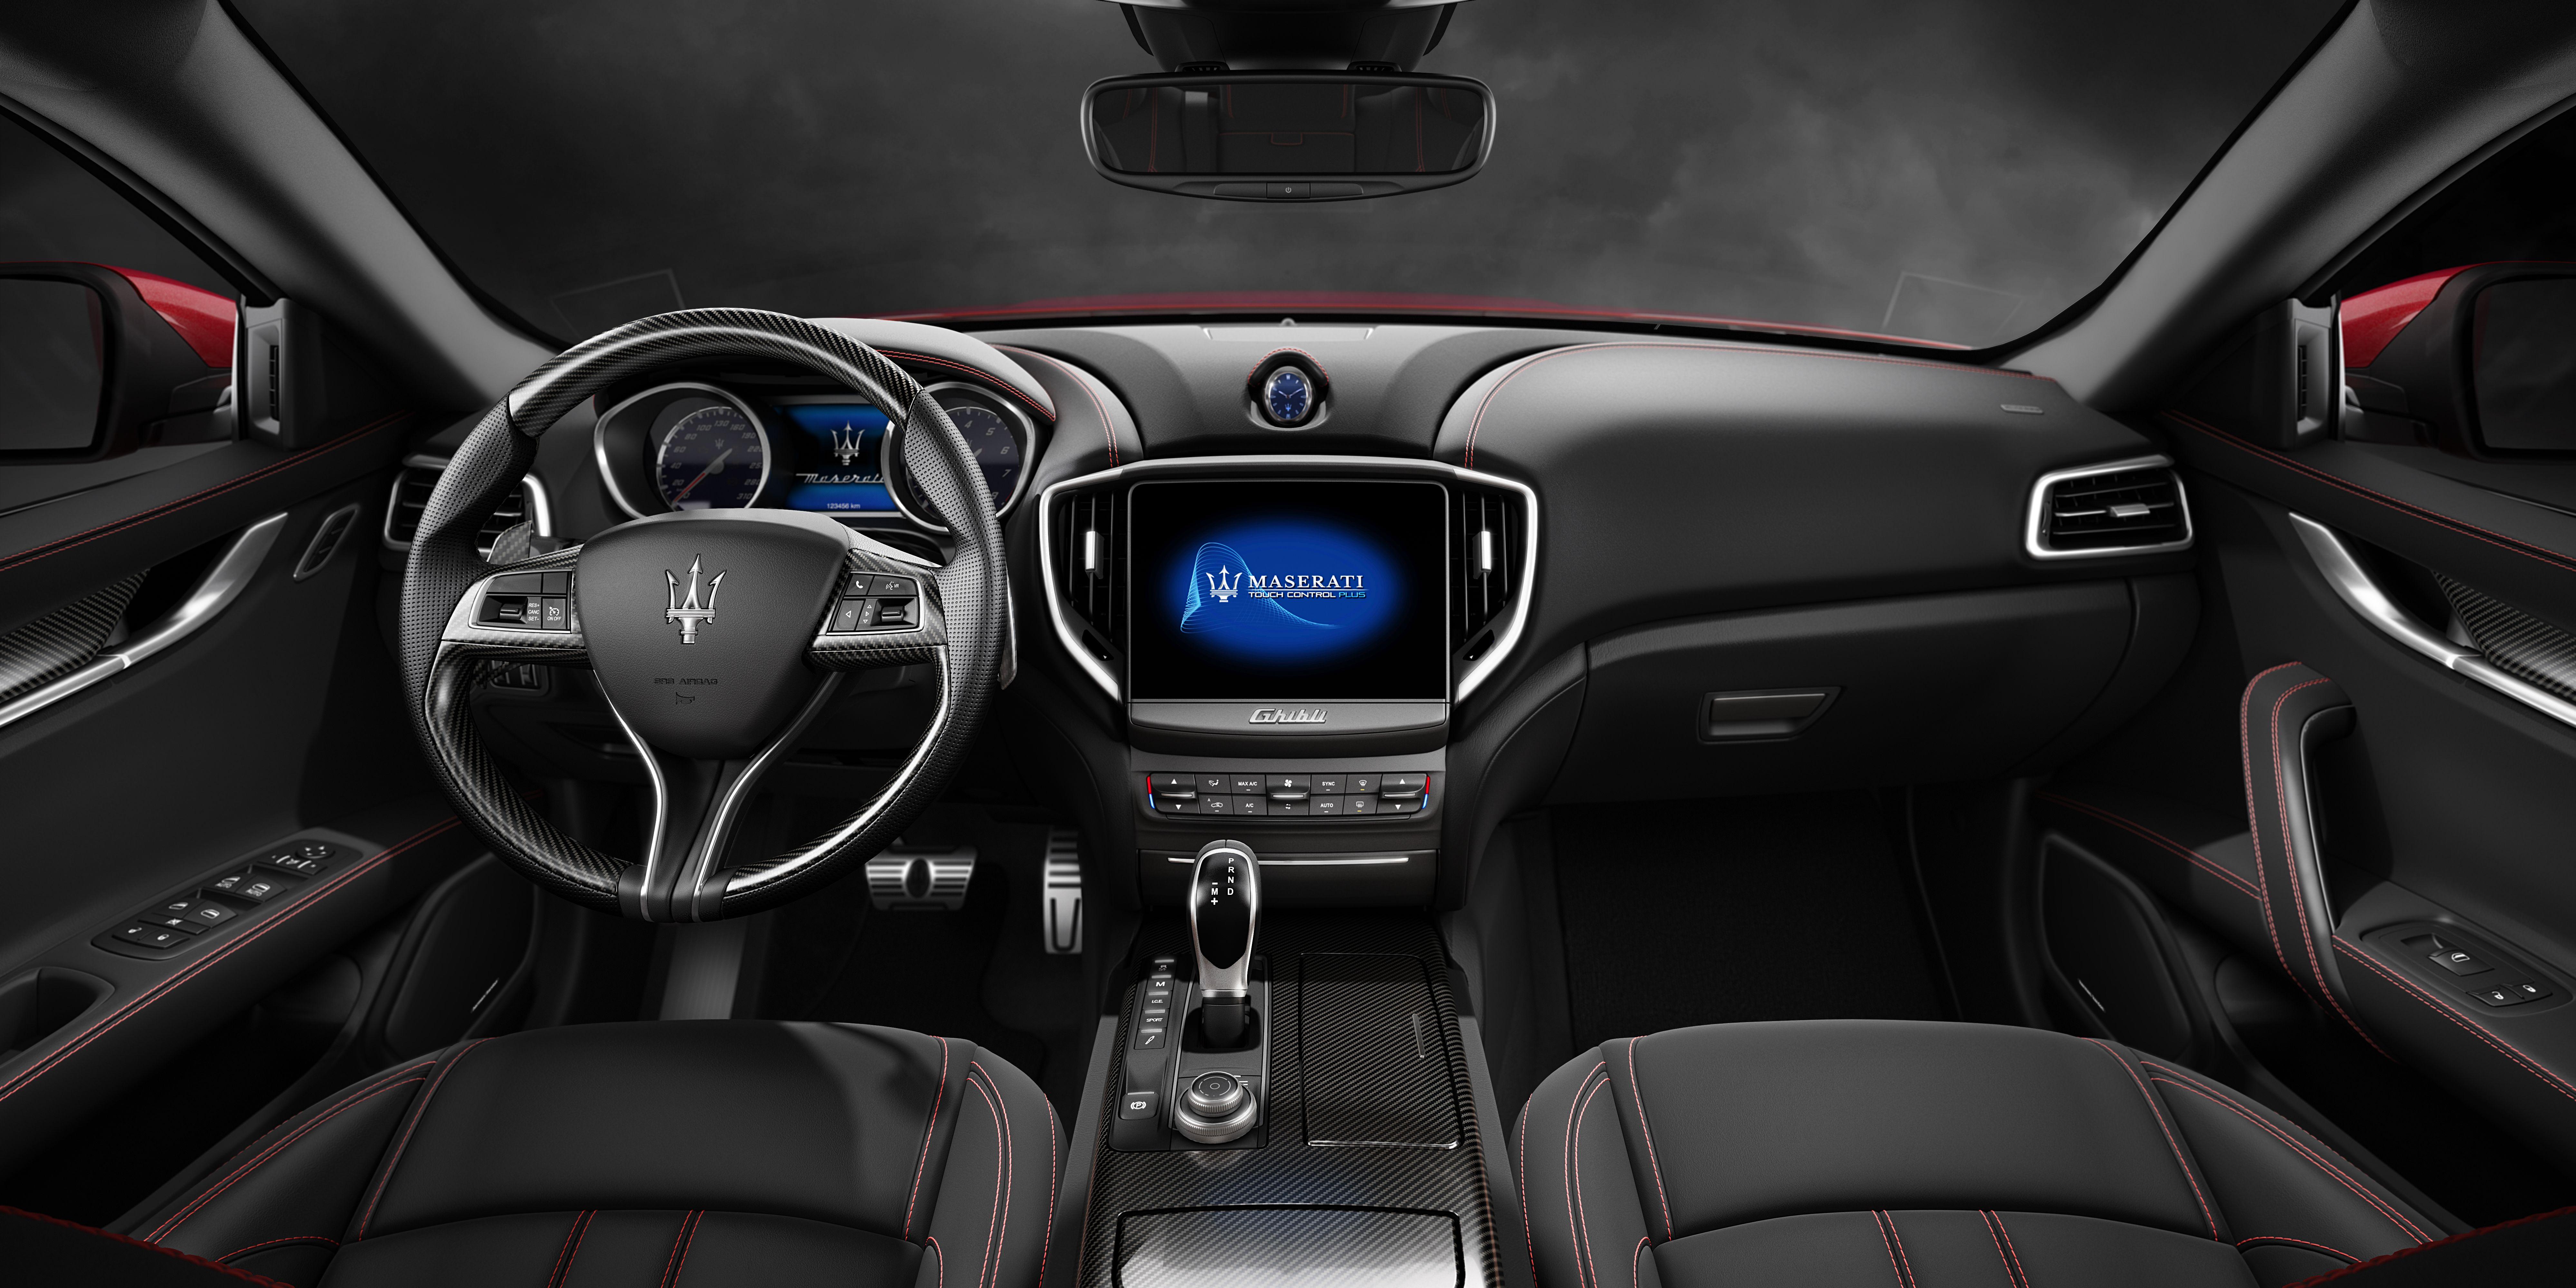 Maserati Ghibli (2014) 23